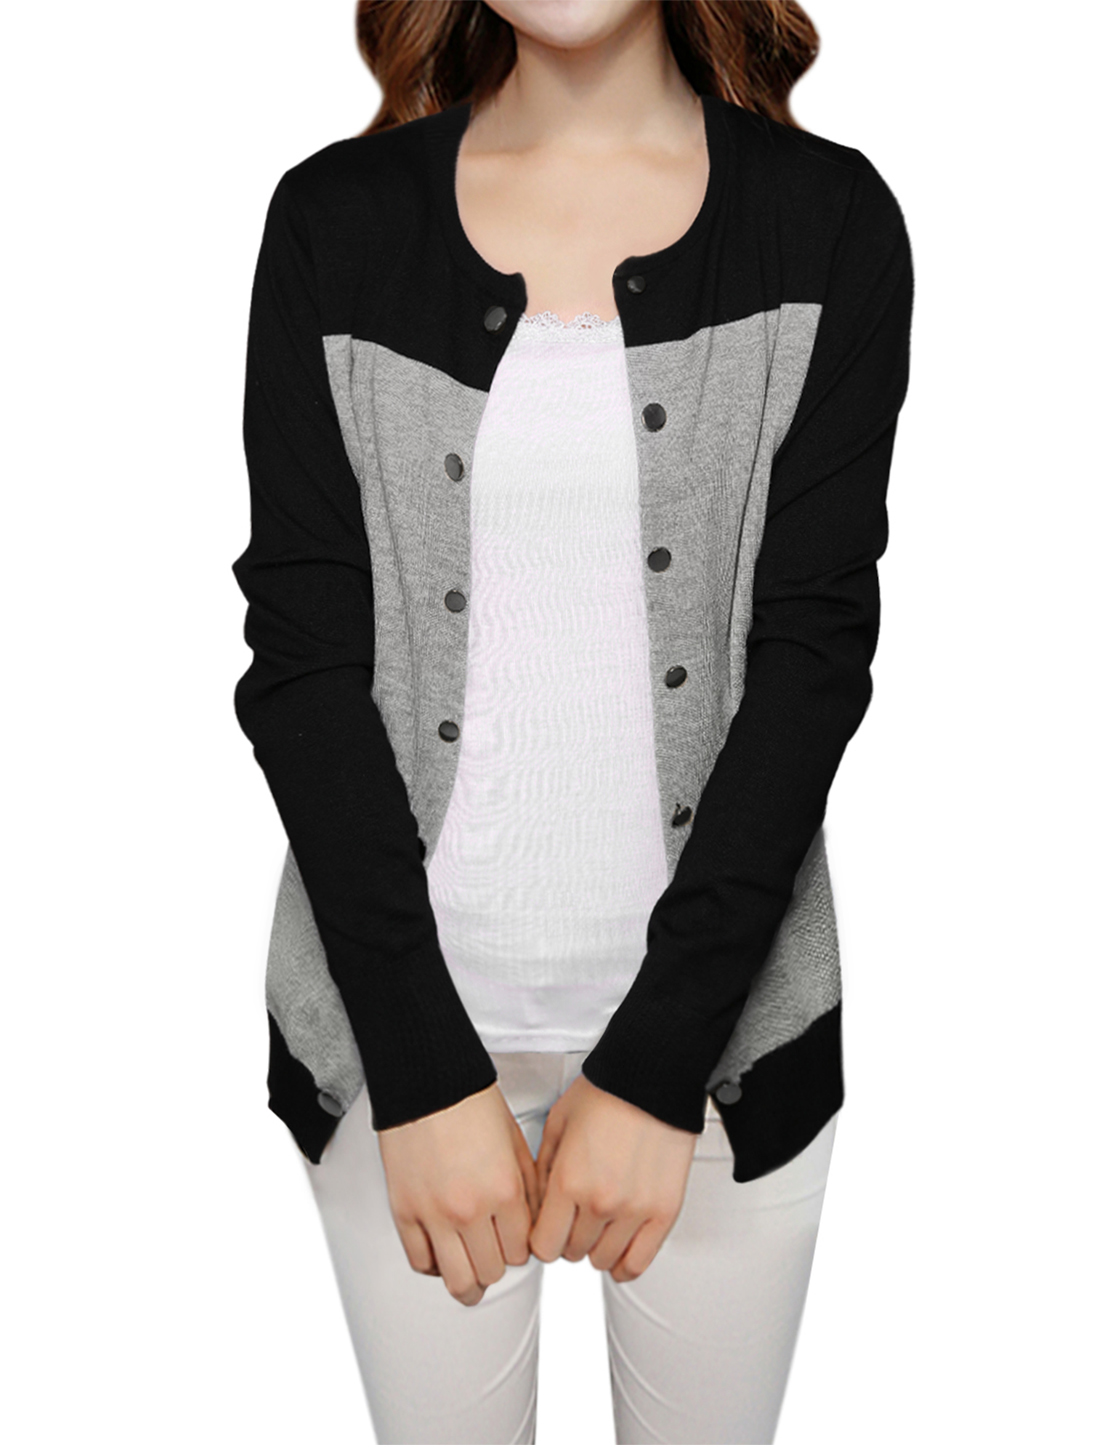 Women Color Block Buttons Decor Slim Fit Knit Cardigan Black Light Gray L